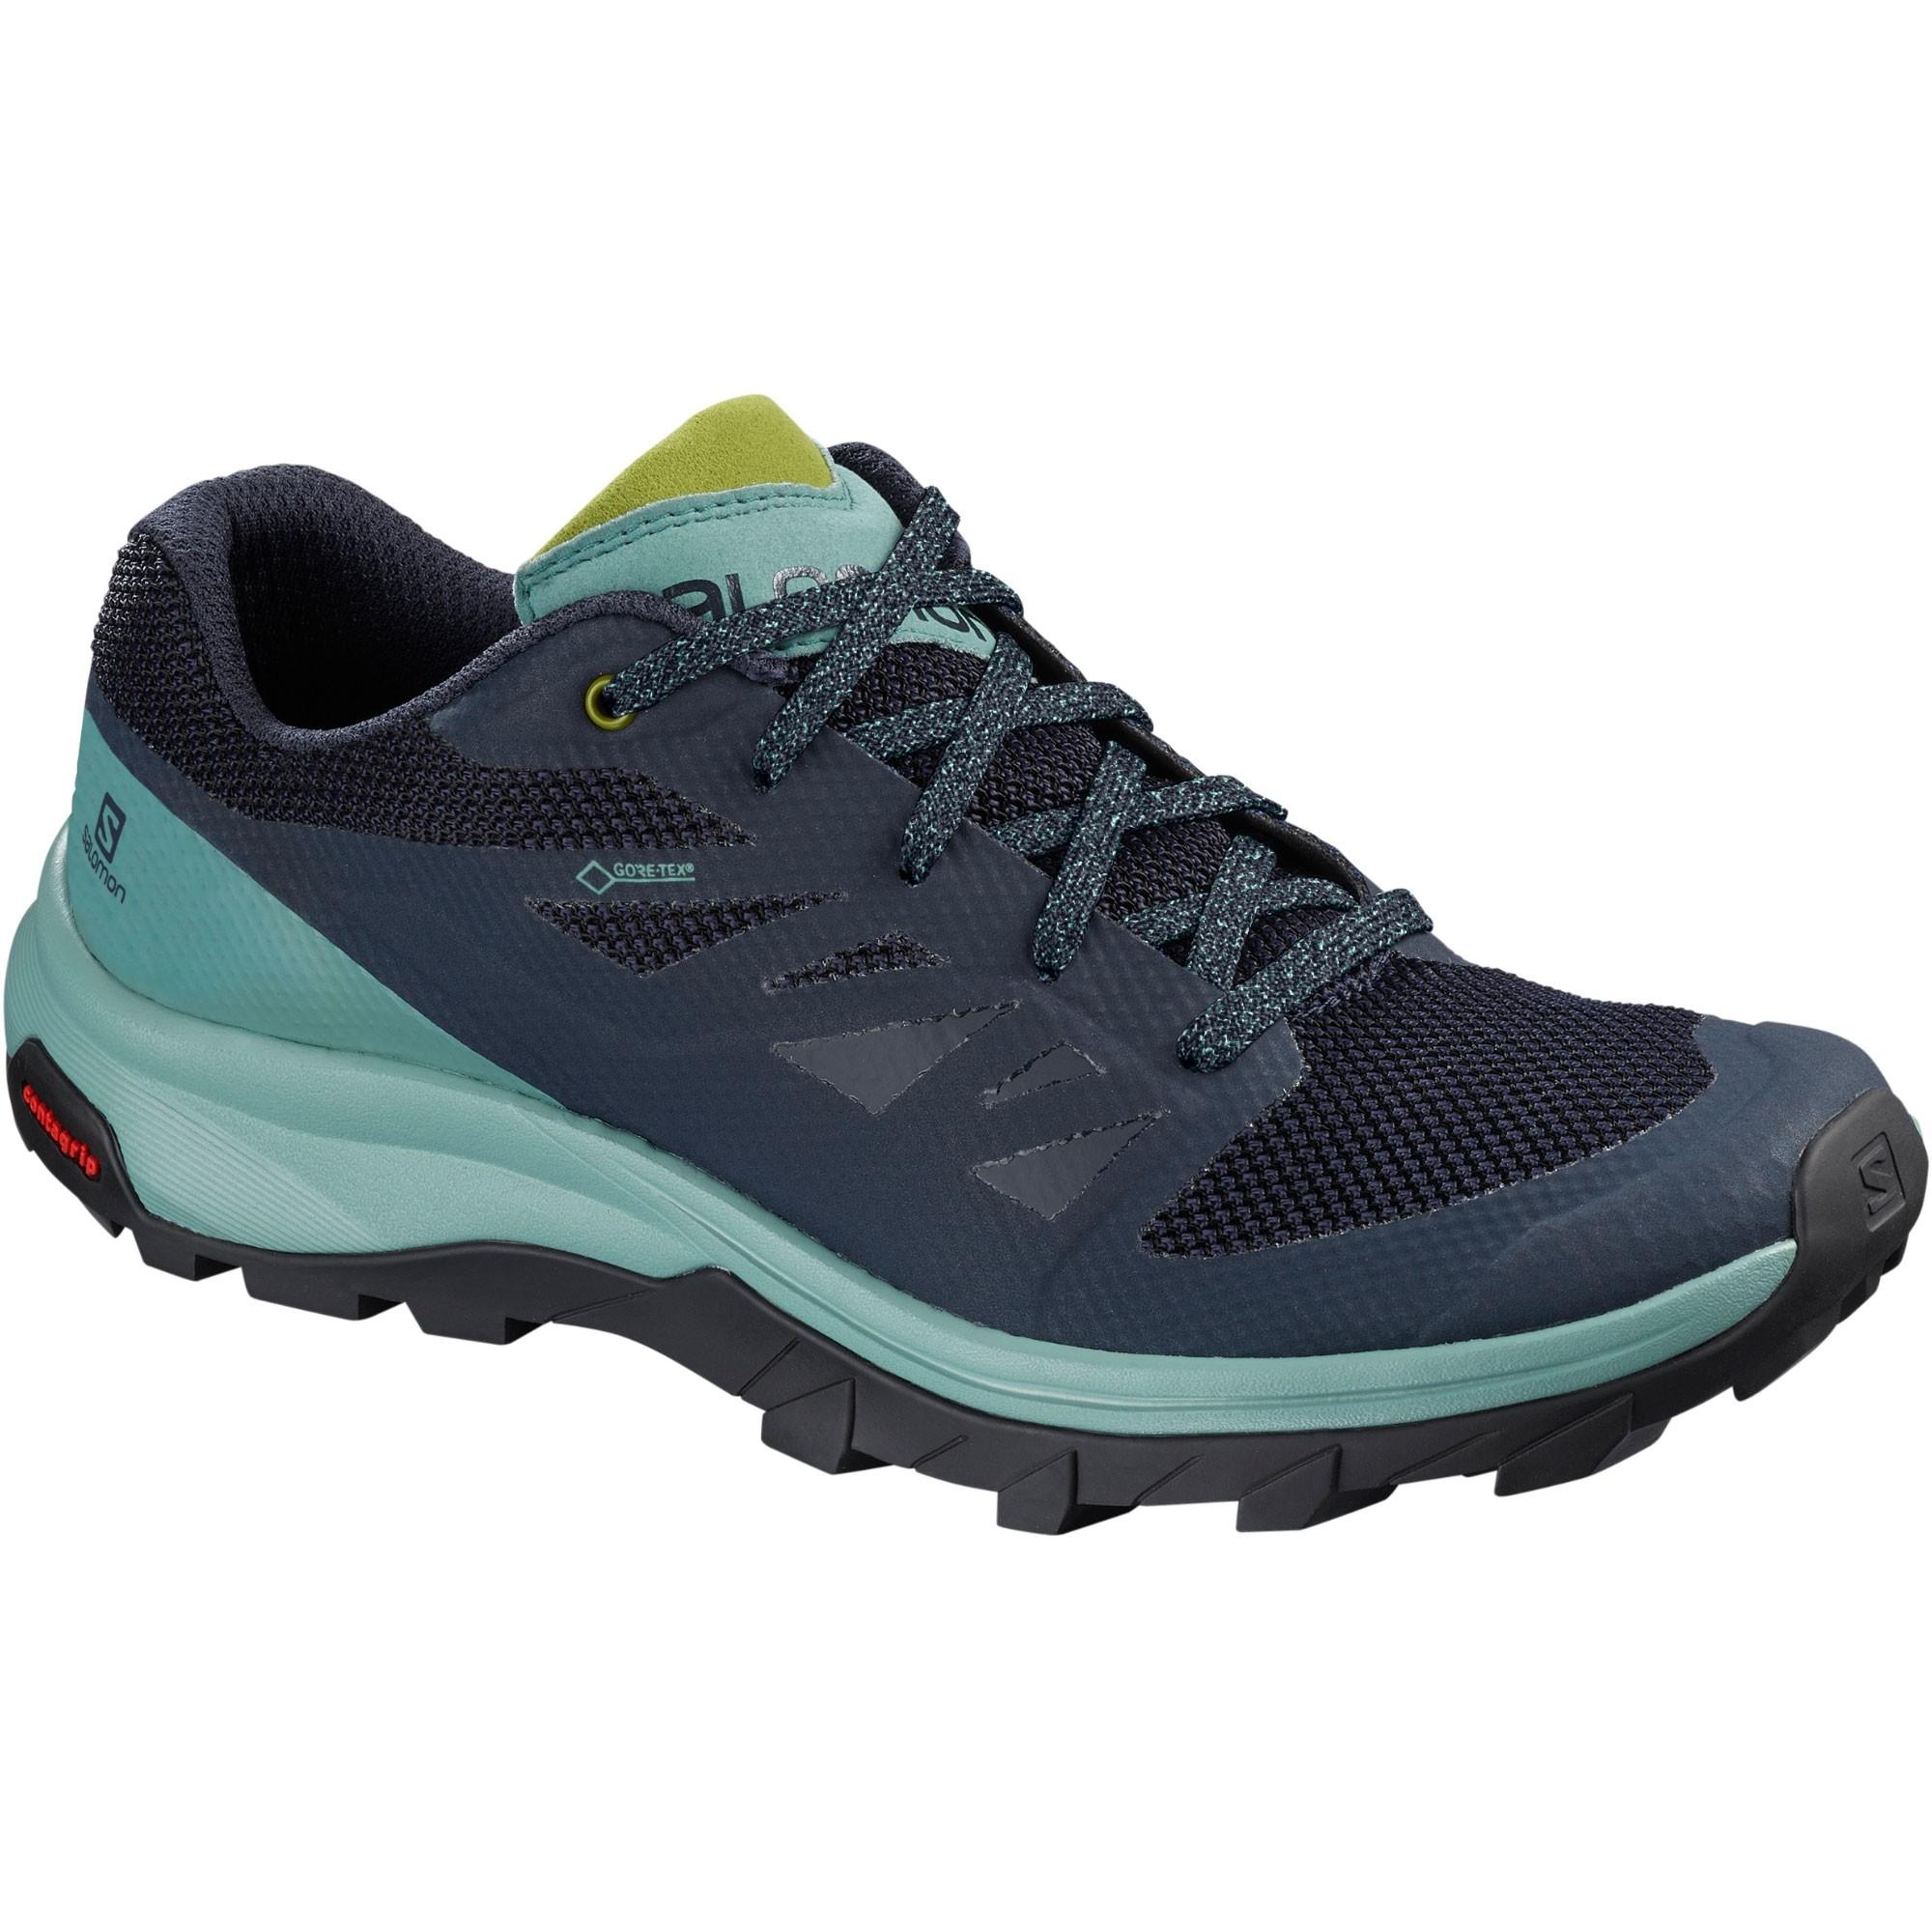 Salomon OUTline GTX Women's Trail Shoe - Trellis/Navy Blazer/Guacamole